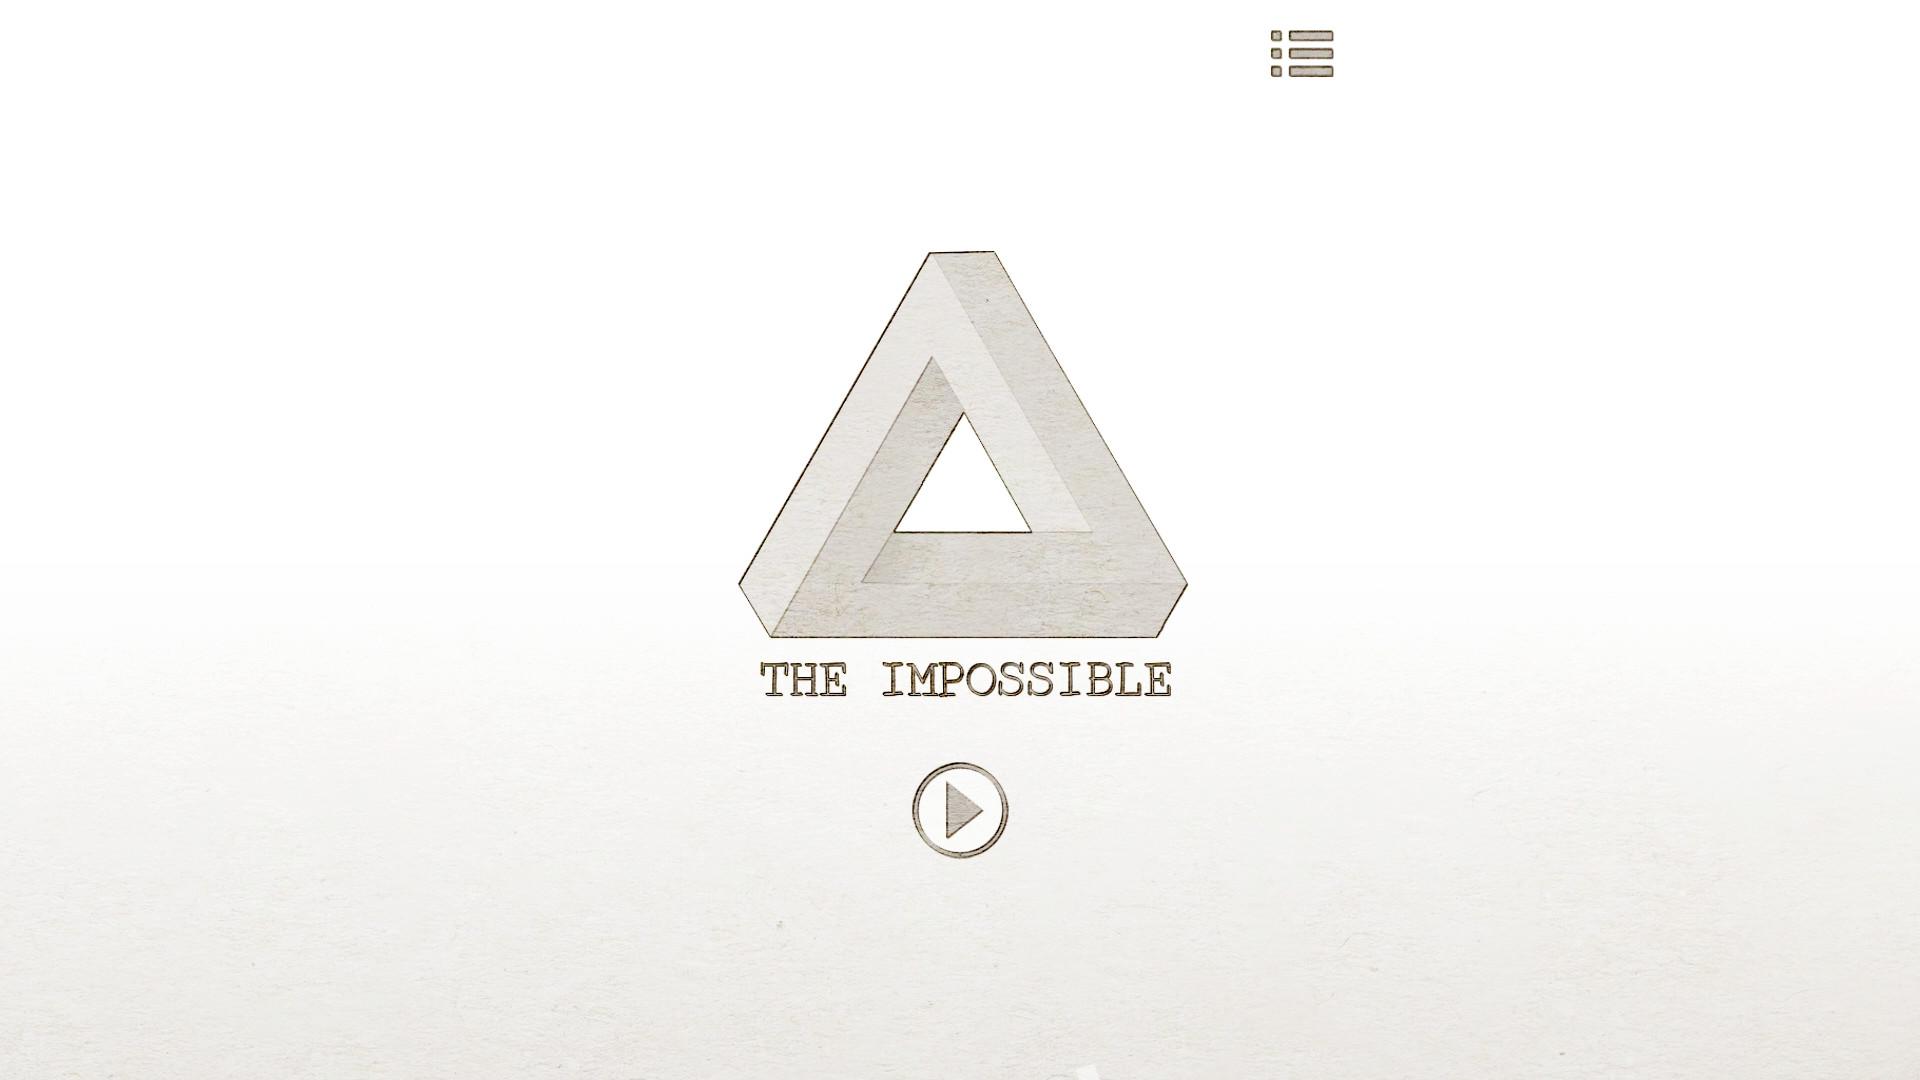 THE IMPOSSIBLE SOUNDTRACK (+Patch autograph) screenshot